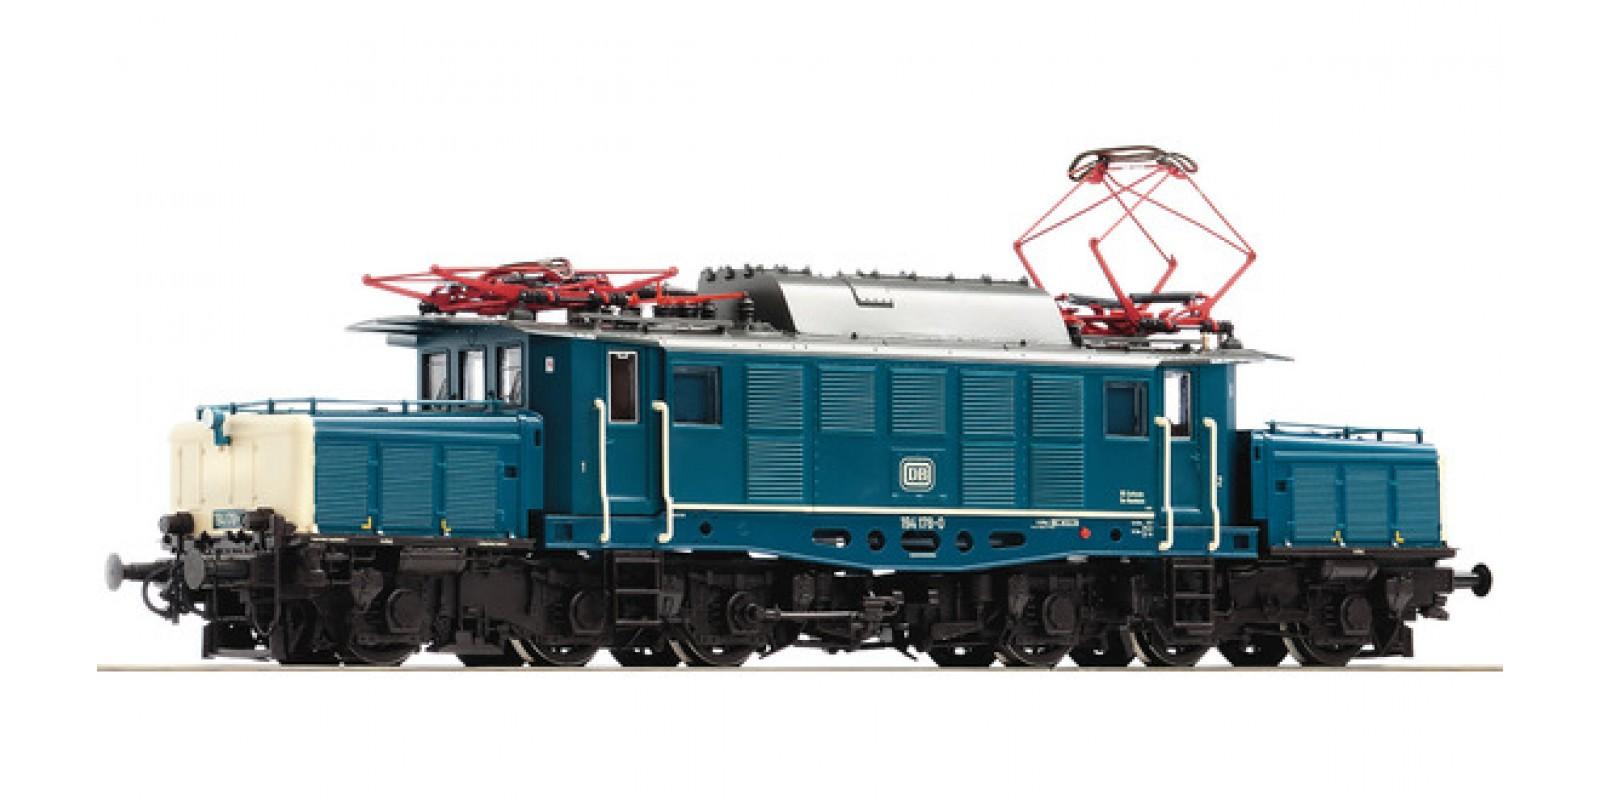 RO73361 - Electric locomotive 194 178, DB